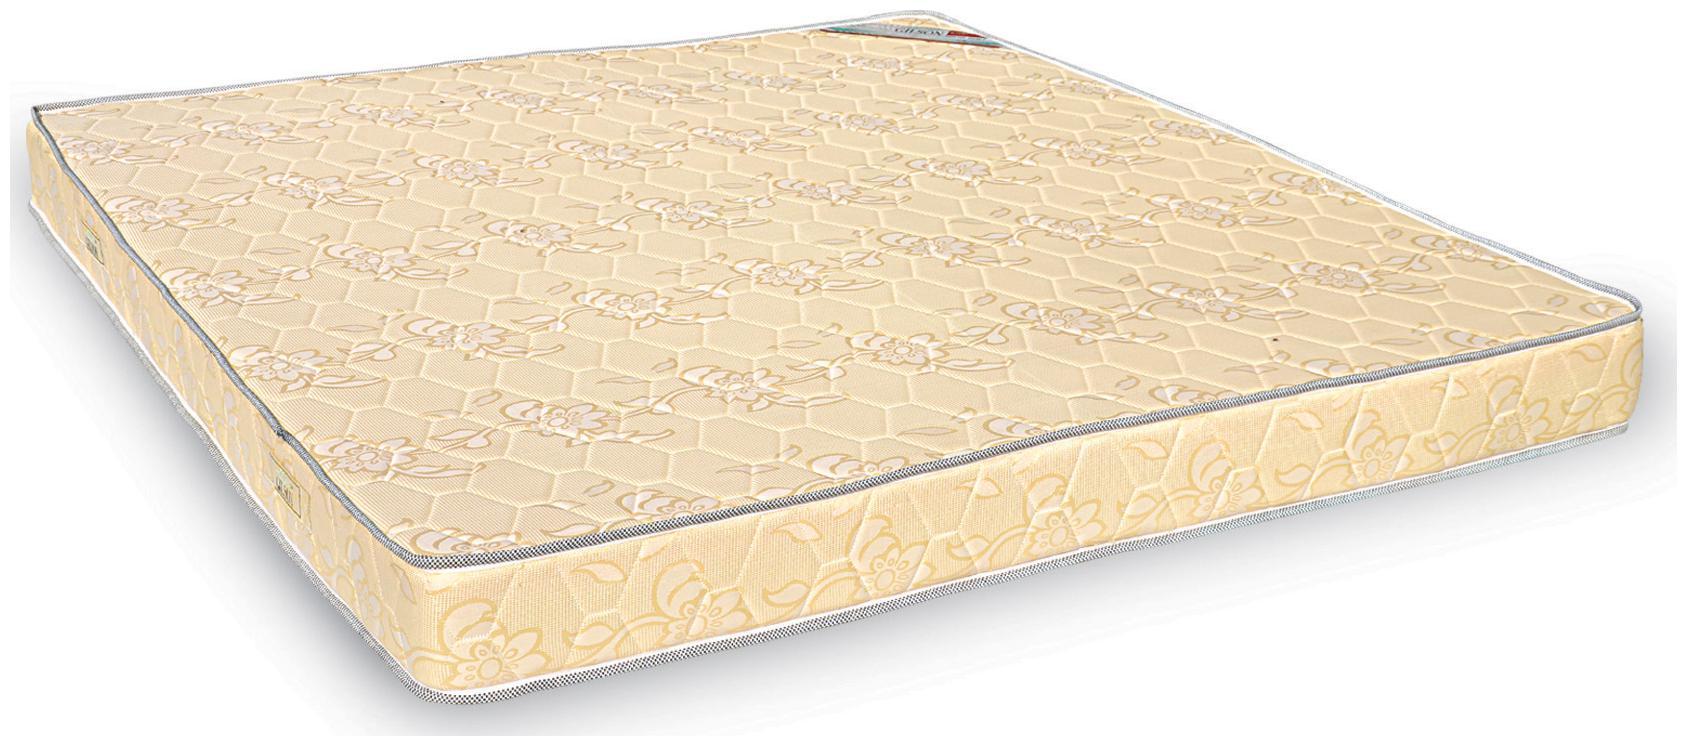 Gilson 8 inch Spring King Size Mattress by Gilson Mattresses